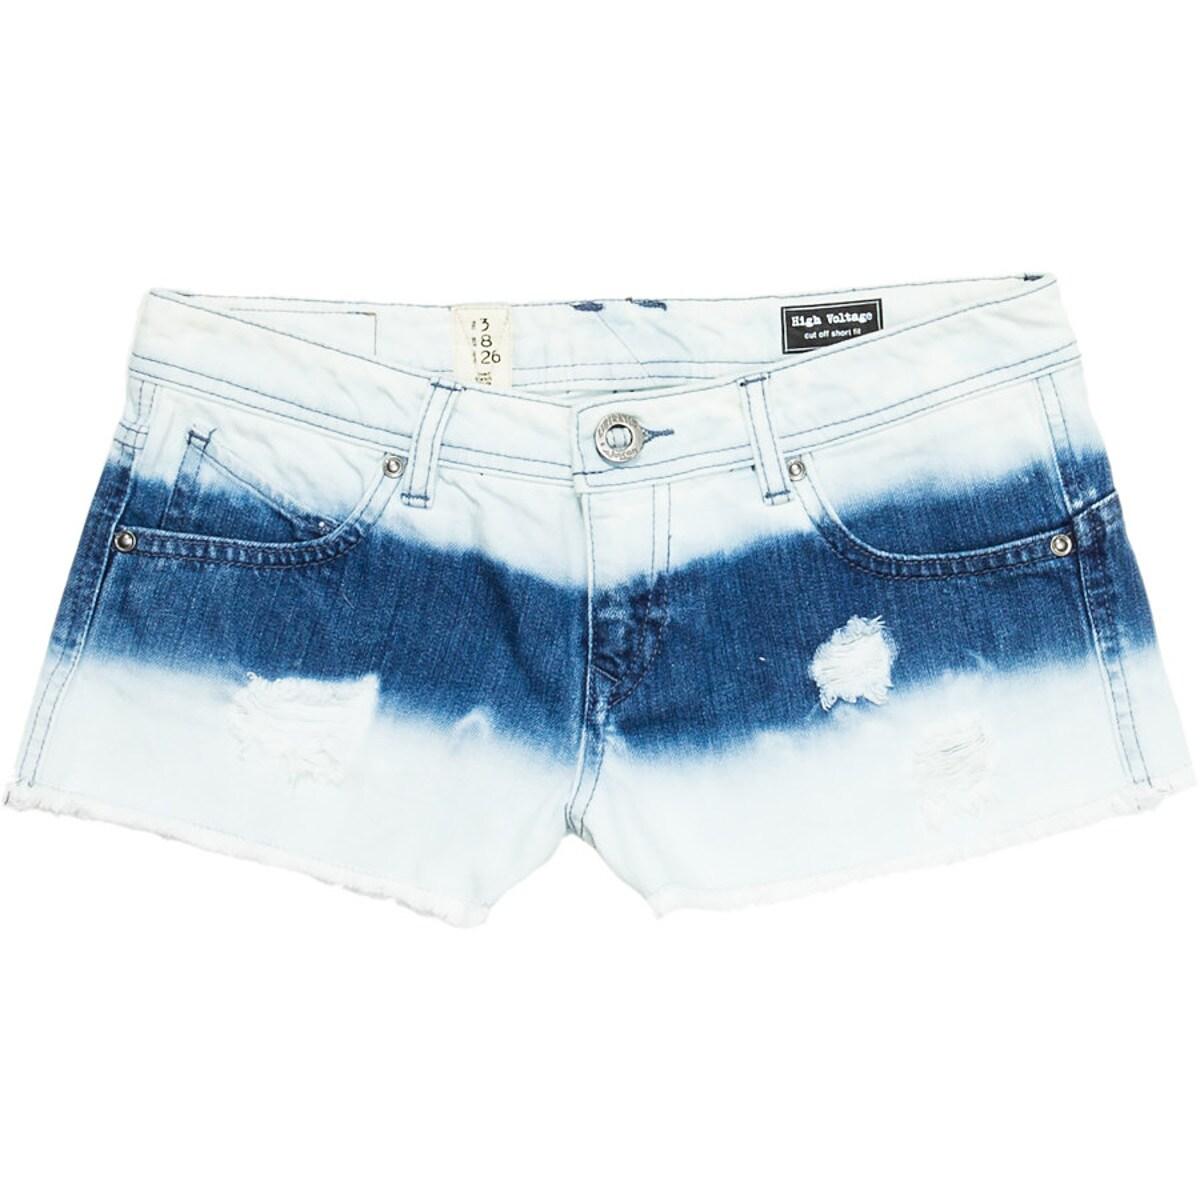 Volcom High Voltage Embellished Shorts - Women's